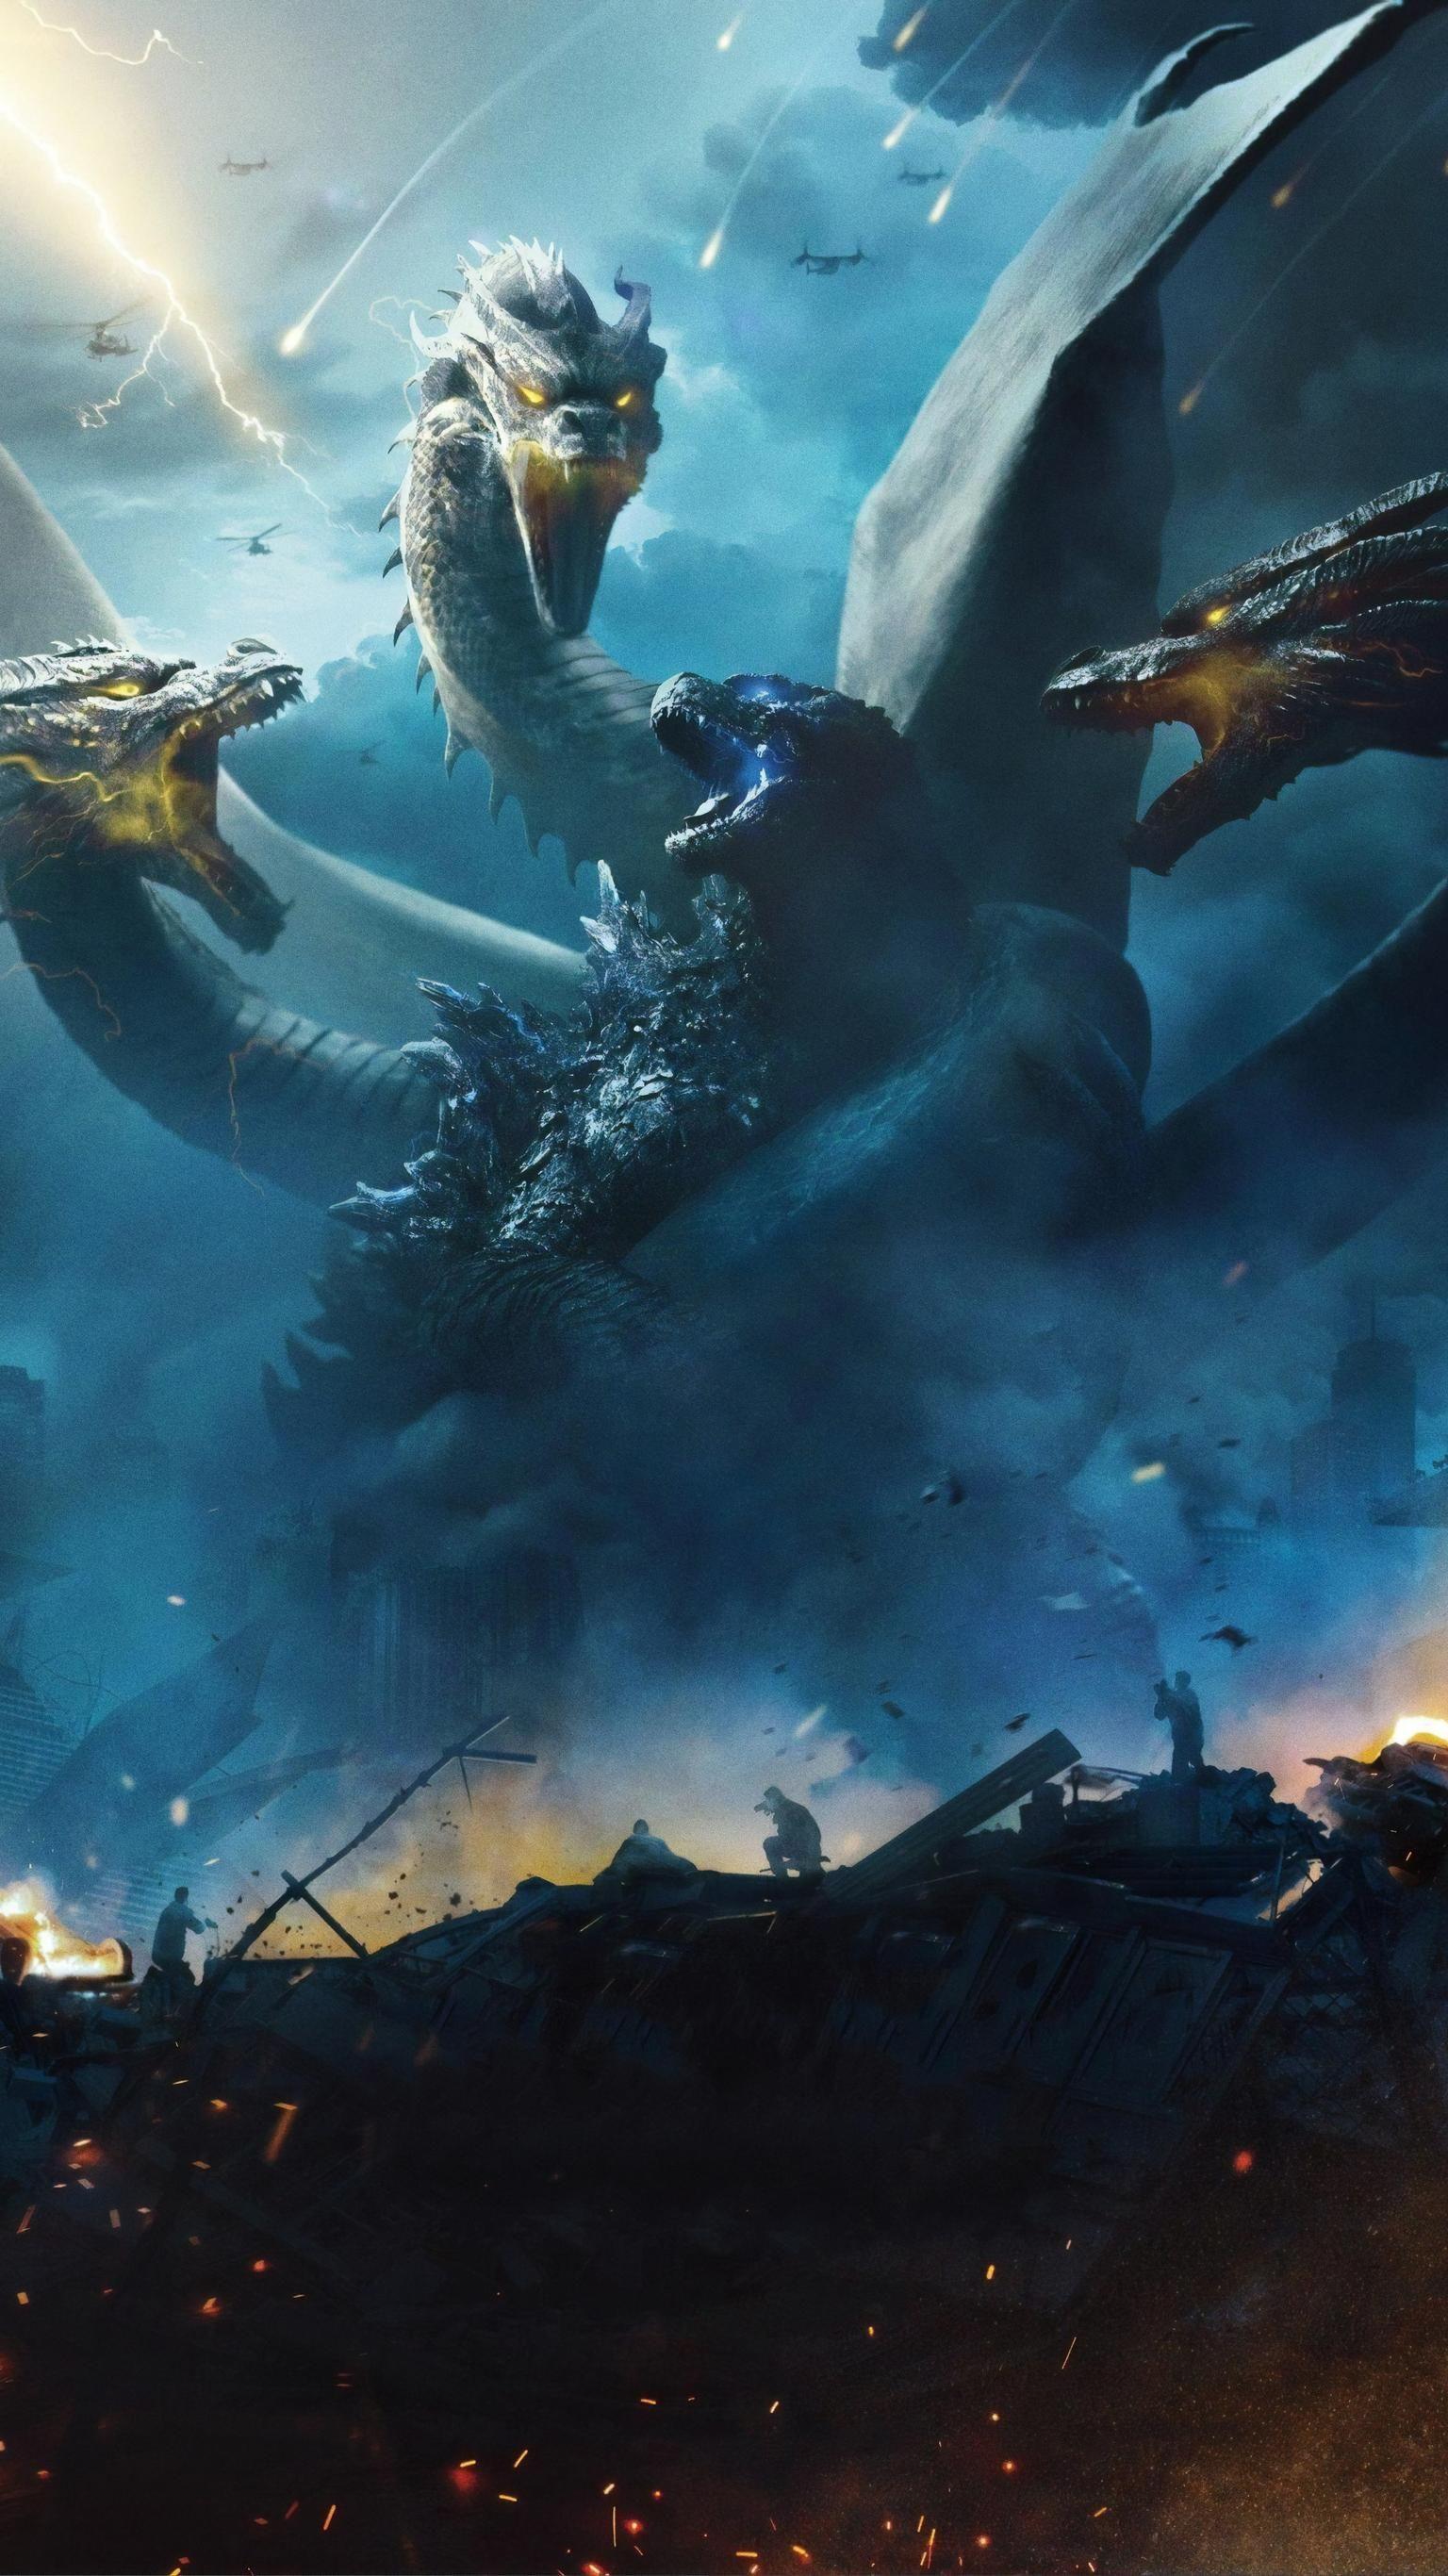 Godzilla King Of The Monsters 2019 Phone Wallpaper Moviemania Godzilla Wallpaper Godzilla Vs King Ghidorah All Godzilla Monsters